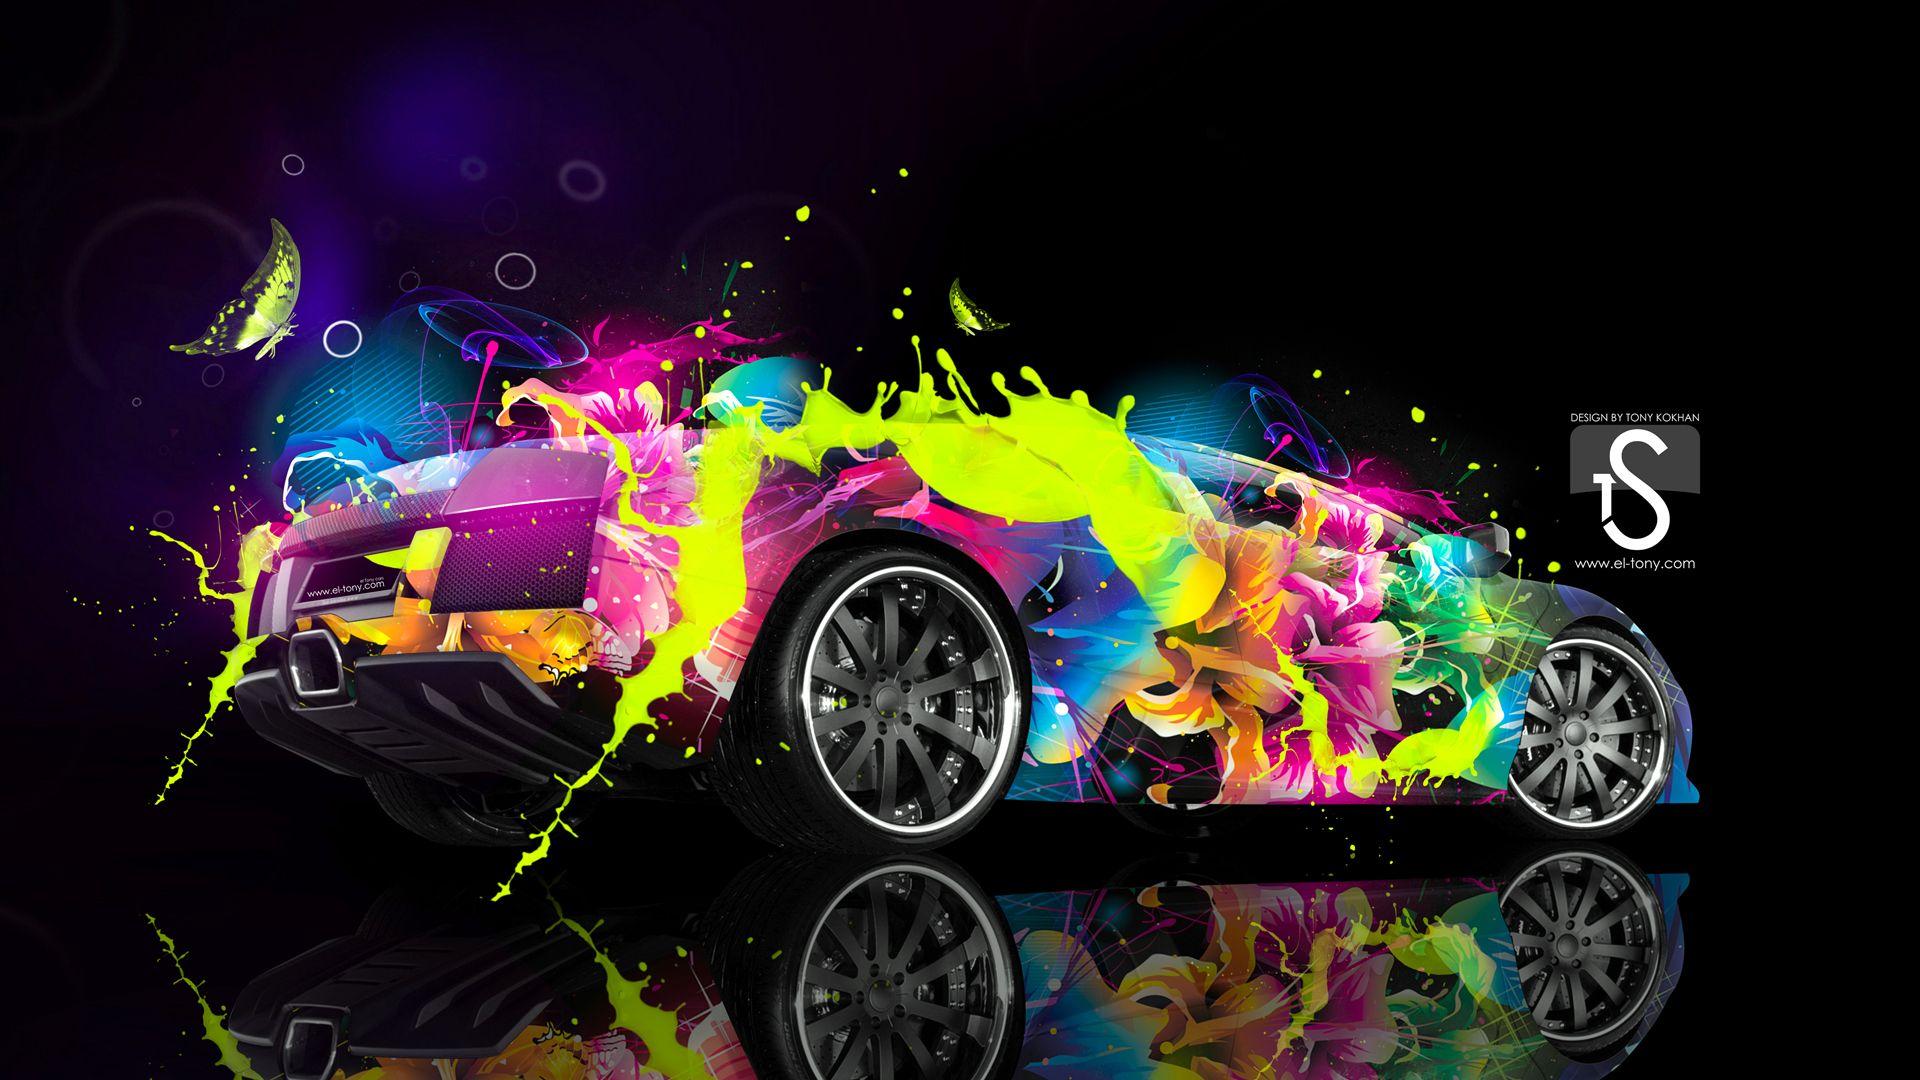 Colorful Cars Wallpaper Full HD #s2w1t5 1920x1080 px 1.05 MB Cars Colorful Cars | libretas ...